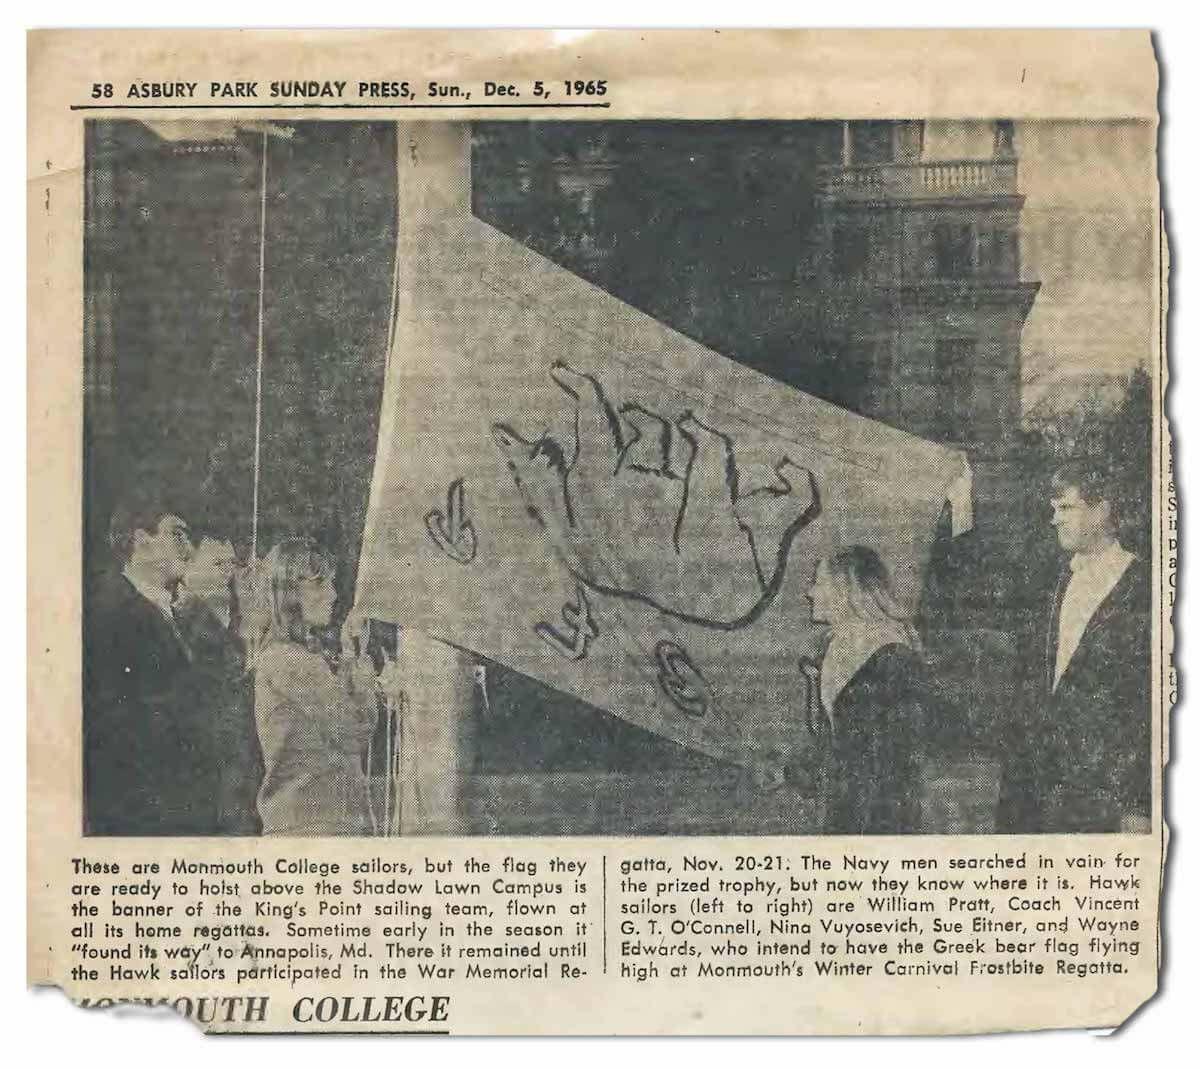 Monmouth College sailors hoisting the U.S. Merchant Marine Academy's Greek bear flag